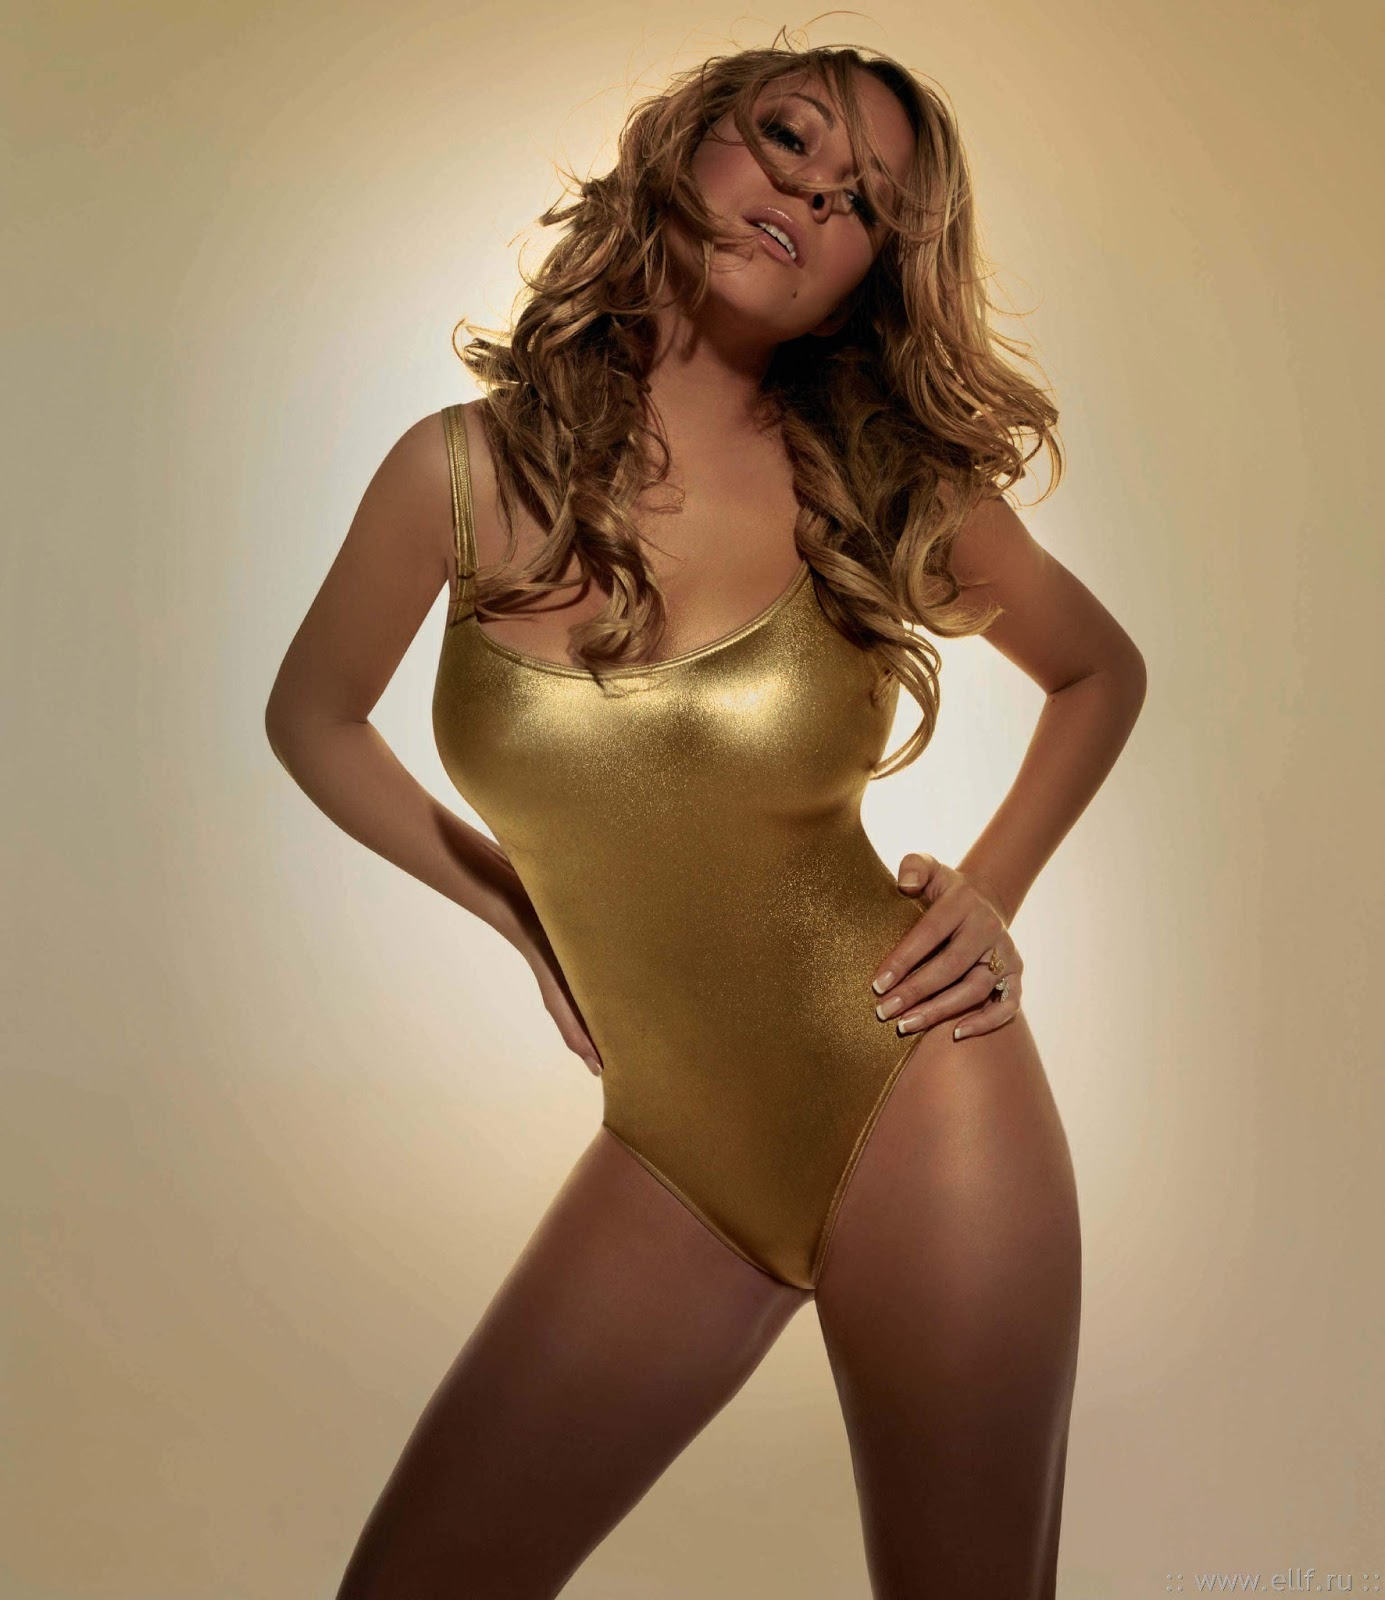 http://4.bp.blogspot.com/-HhBVlOiZB80/URfay6padYI/AAAAAAAAwm8/nhVsFoRvwxw/s1600/Mariah-Carey-swimsuit.jpg